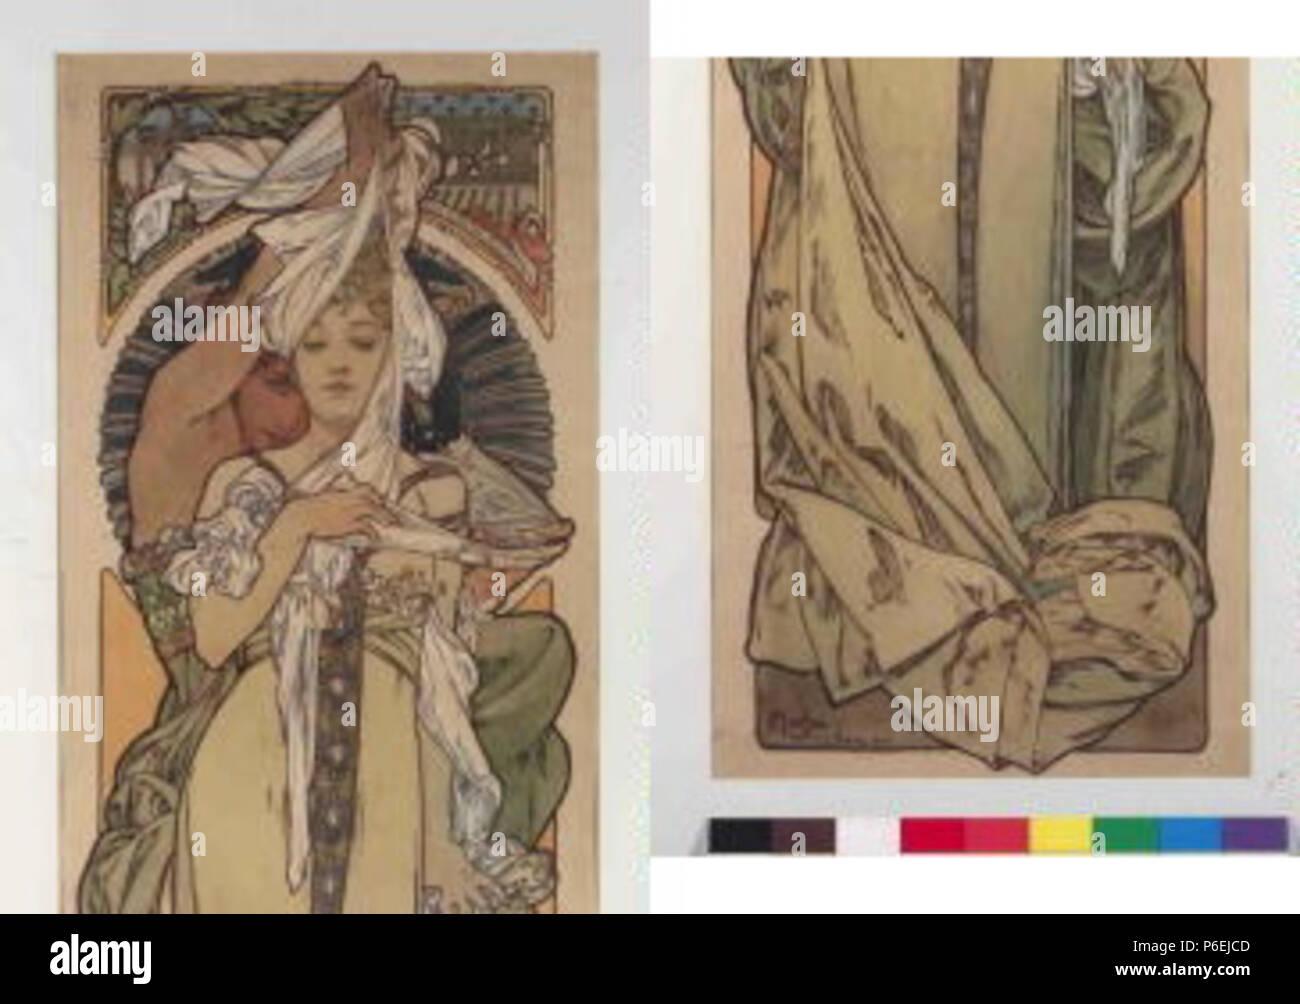 .: Eština Pravá strana plakátu Fluctuat 1900 6 Autor Alfons Mucha 24.7.1860-14.7.1939 - Prava strana plakatu Fluctuat Foto de stock